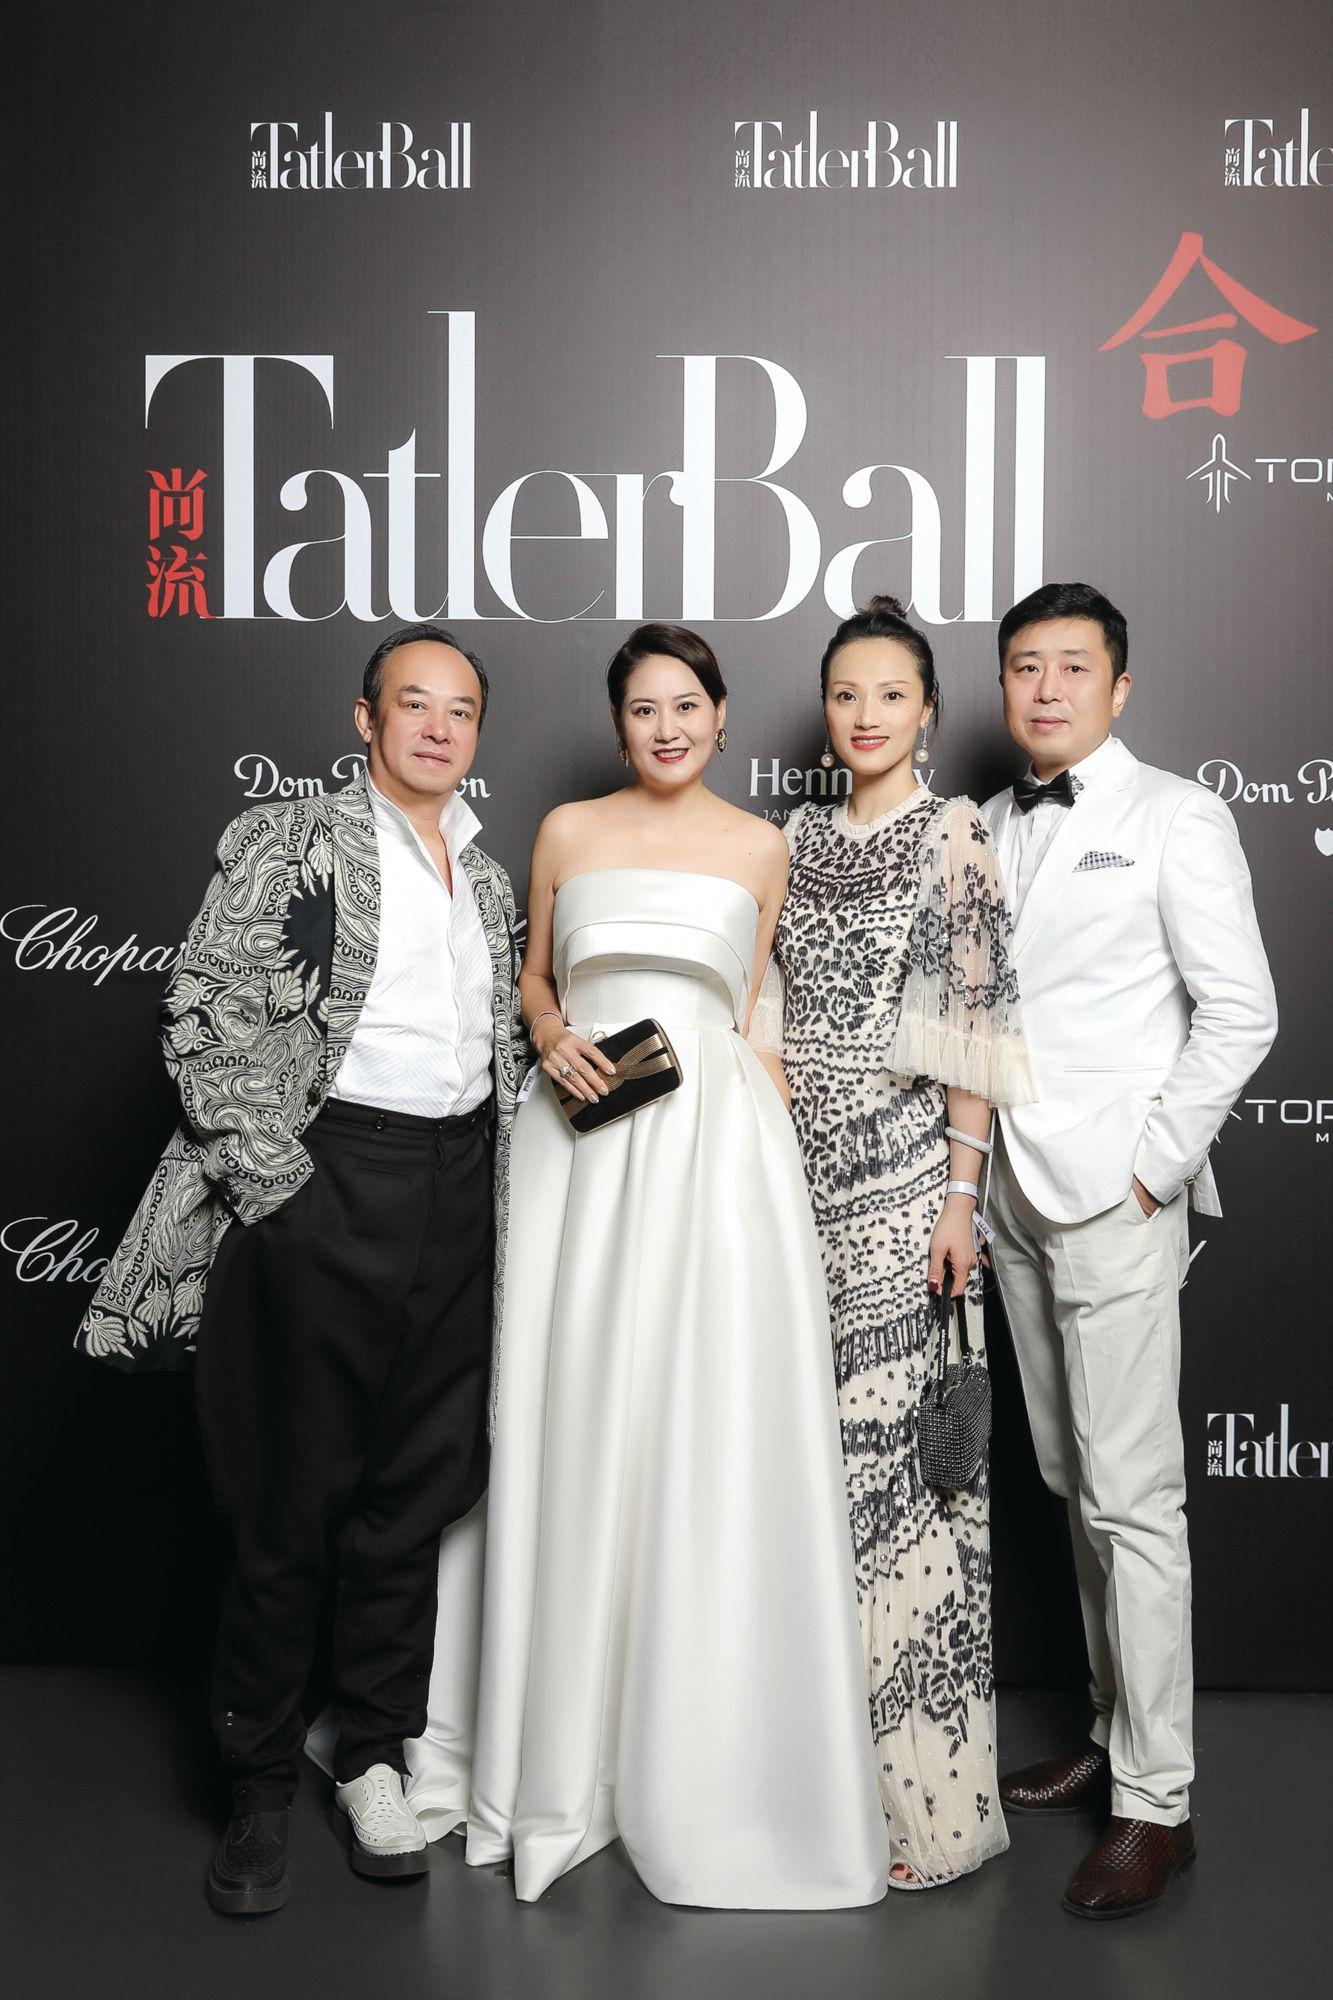 Inside The Shangliu Tatler Ball 2020